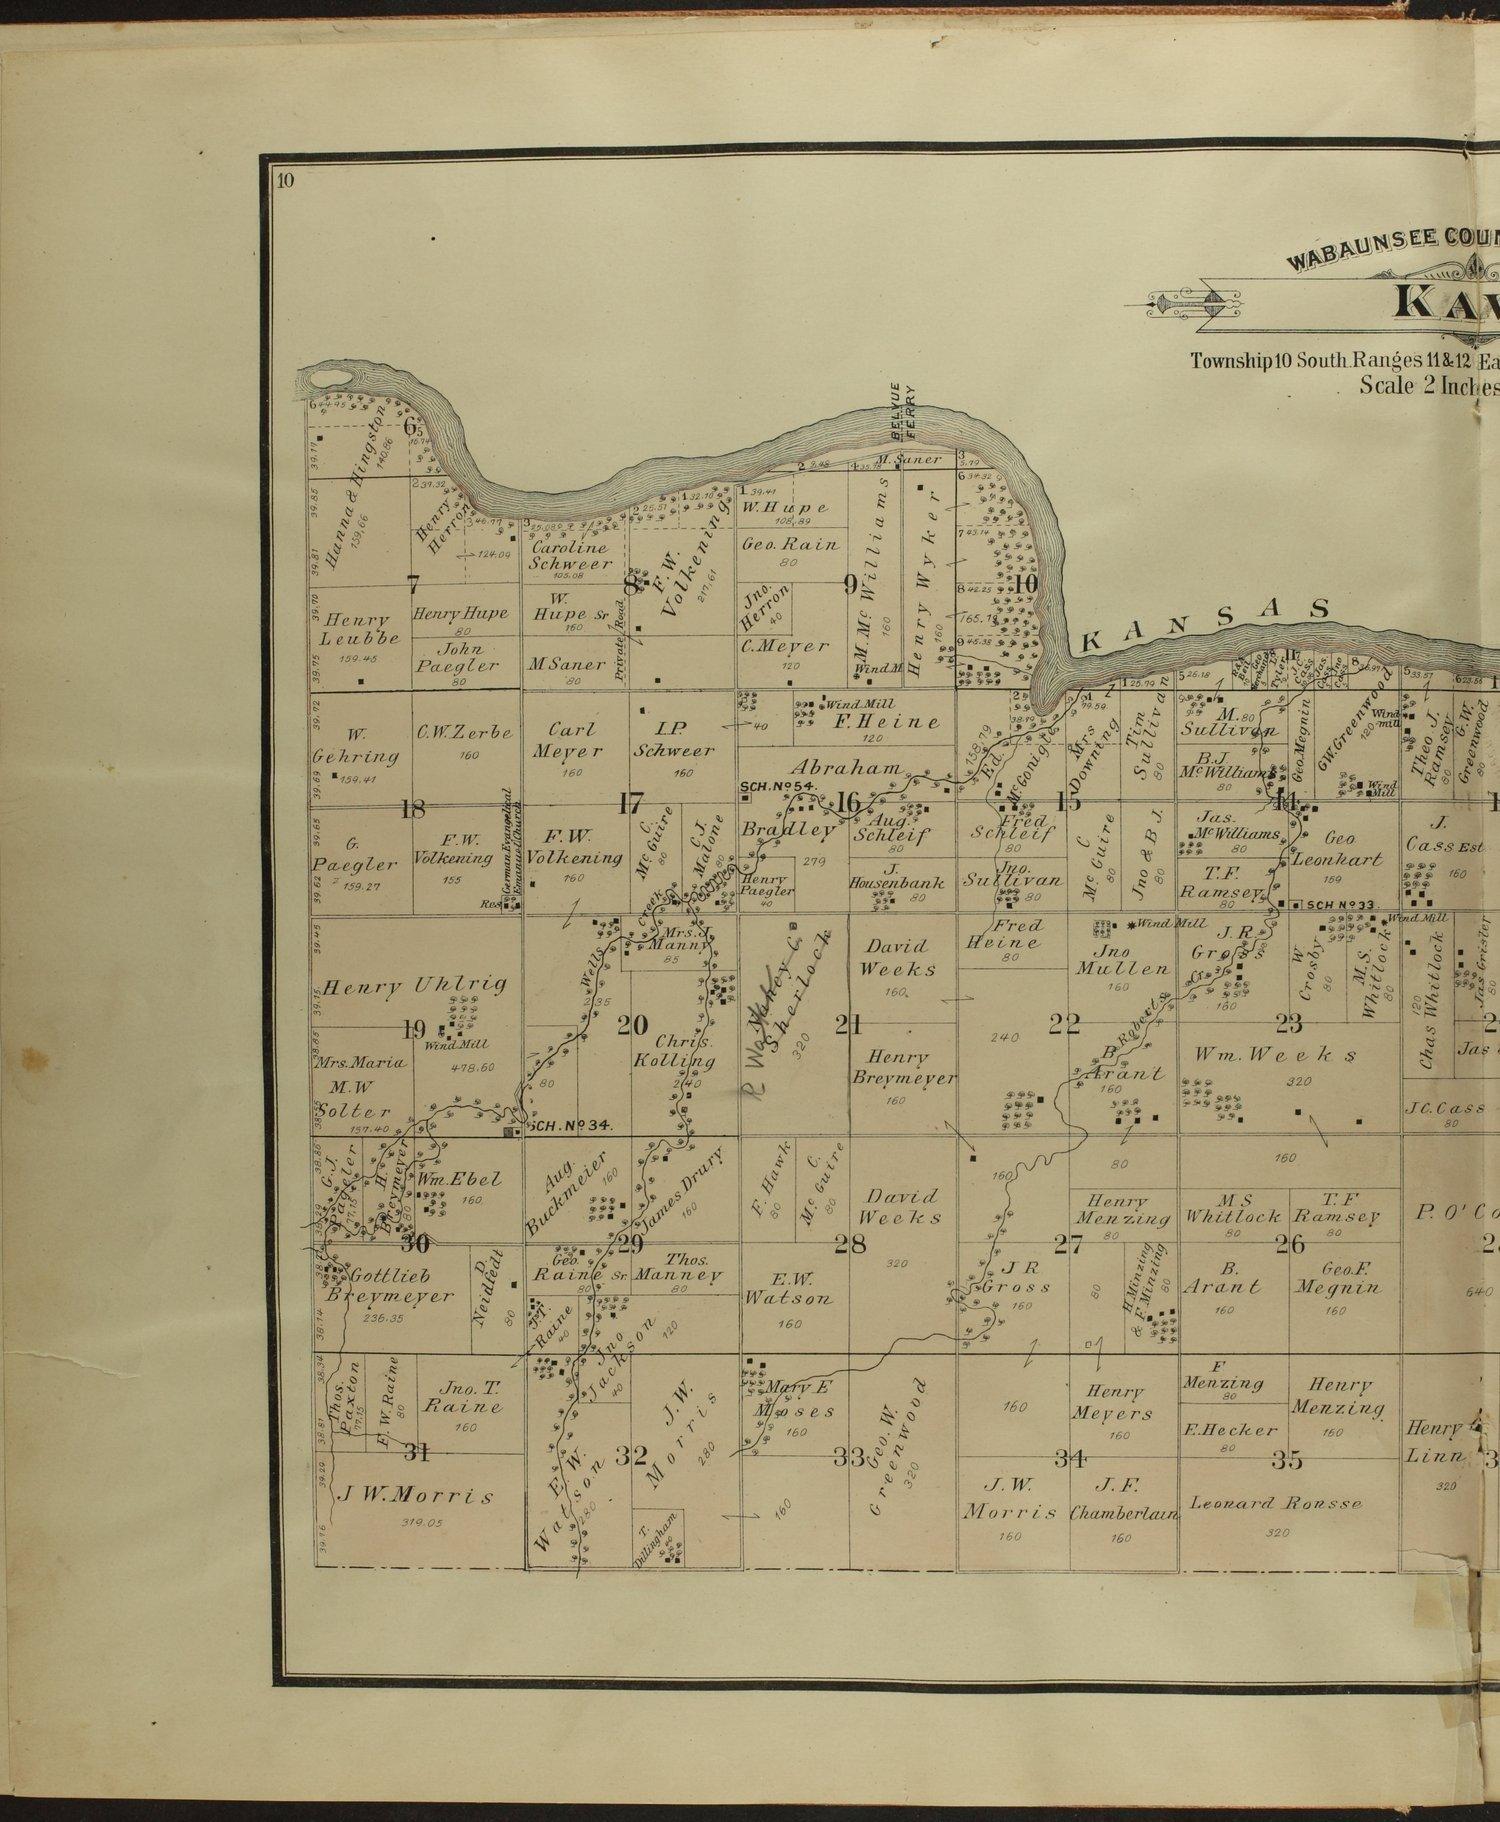 Atlas of Wabaunsee County, Kansas - 10